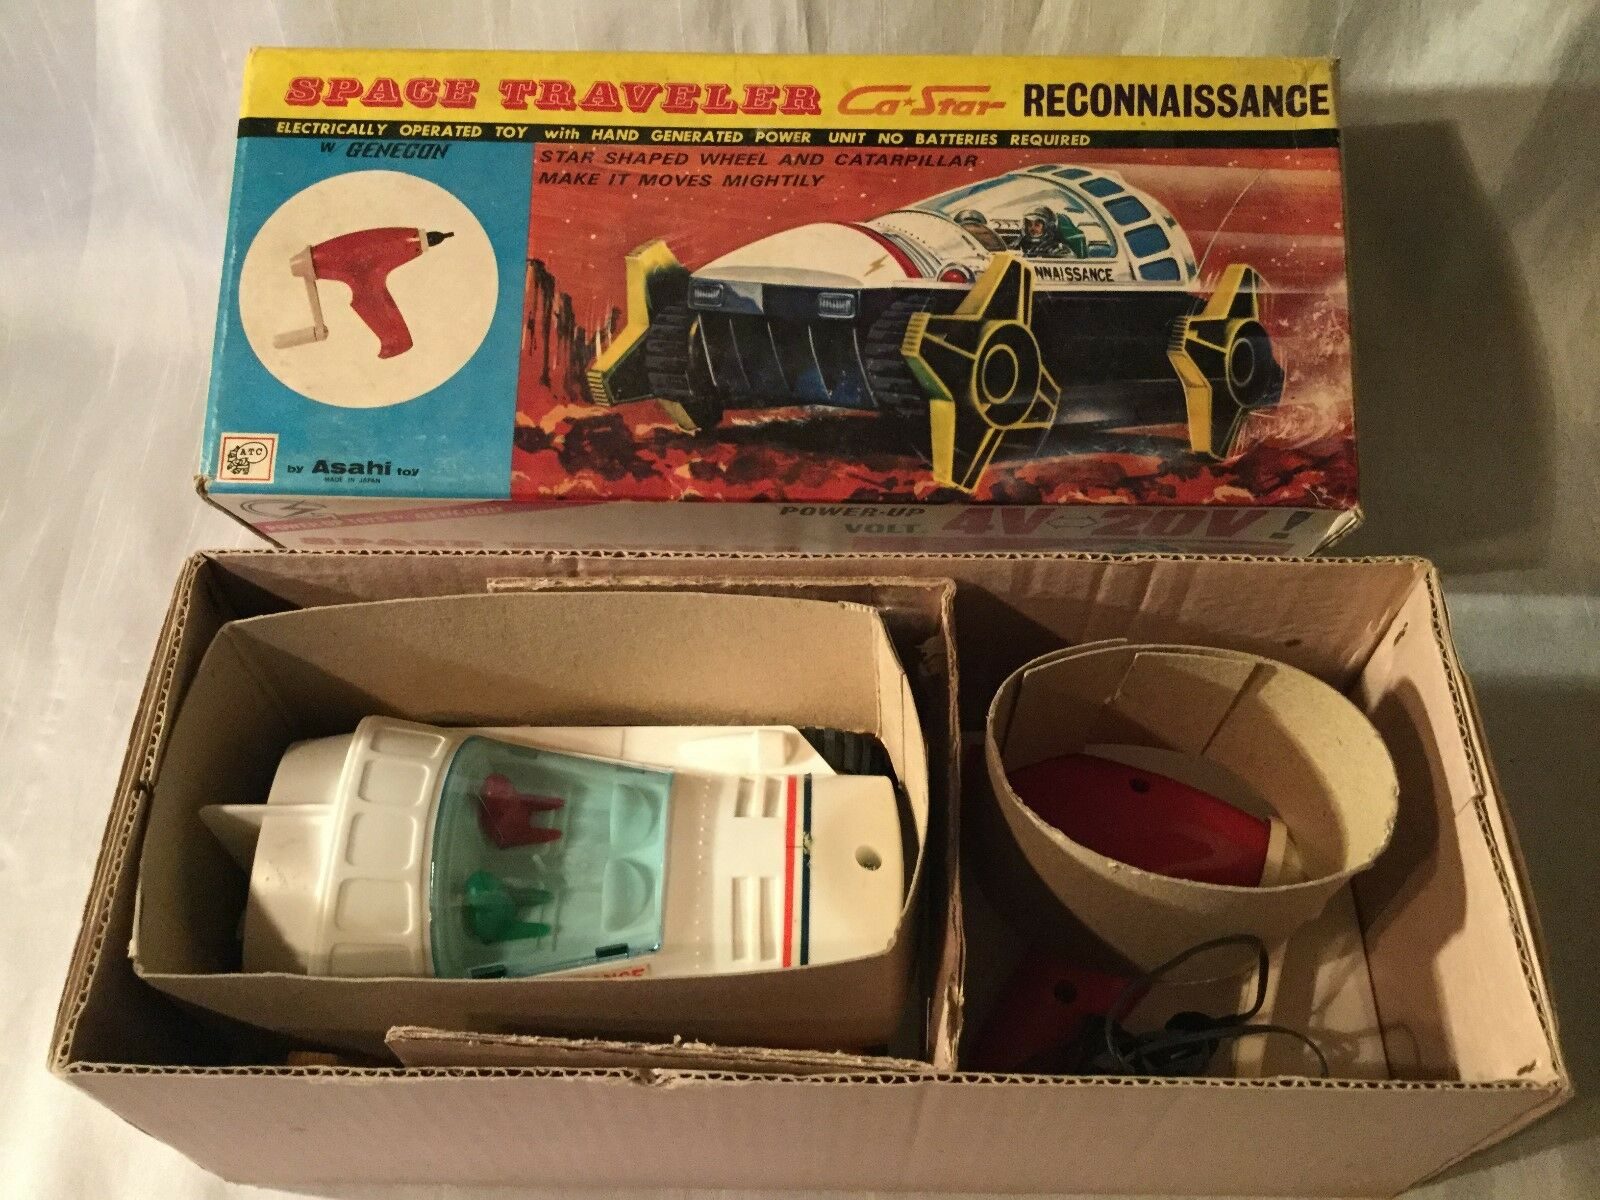 Asahi Toy no. 3940 Space Traveler Ca Star Reconnaissance Japan Boxed